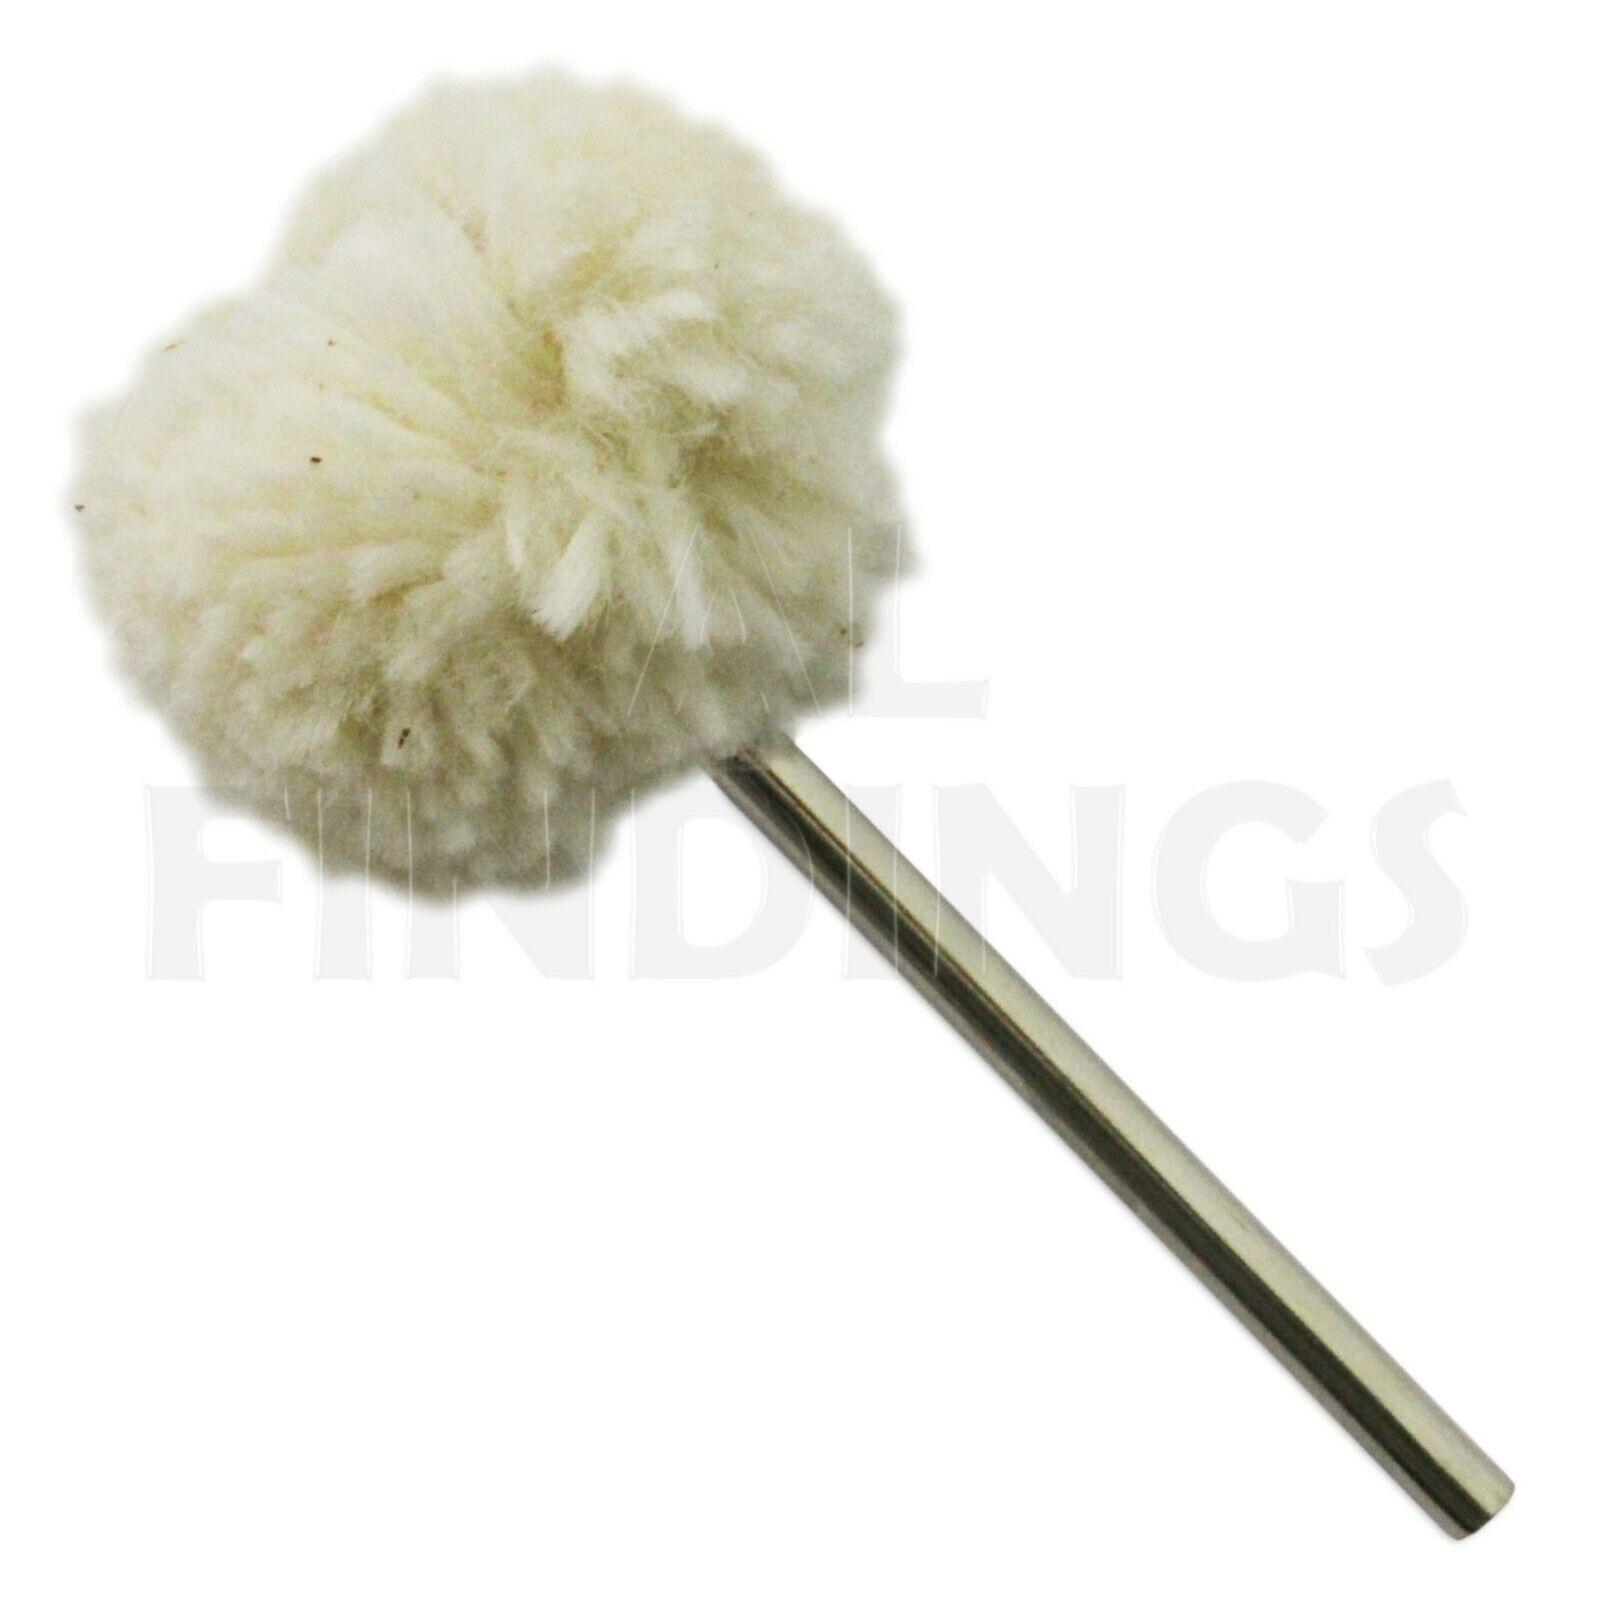 "Mop Polish Jewellery 4/"" Calico Buff Combed Fine Soft"